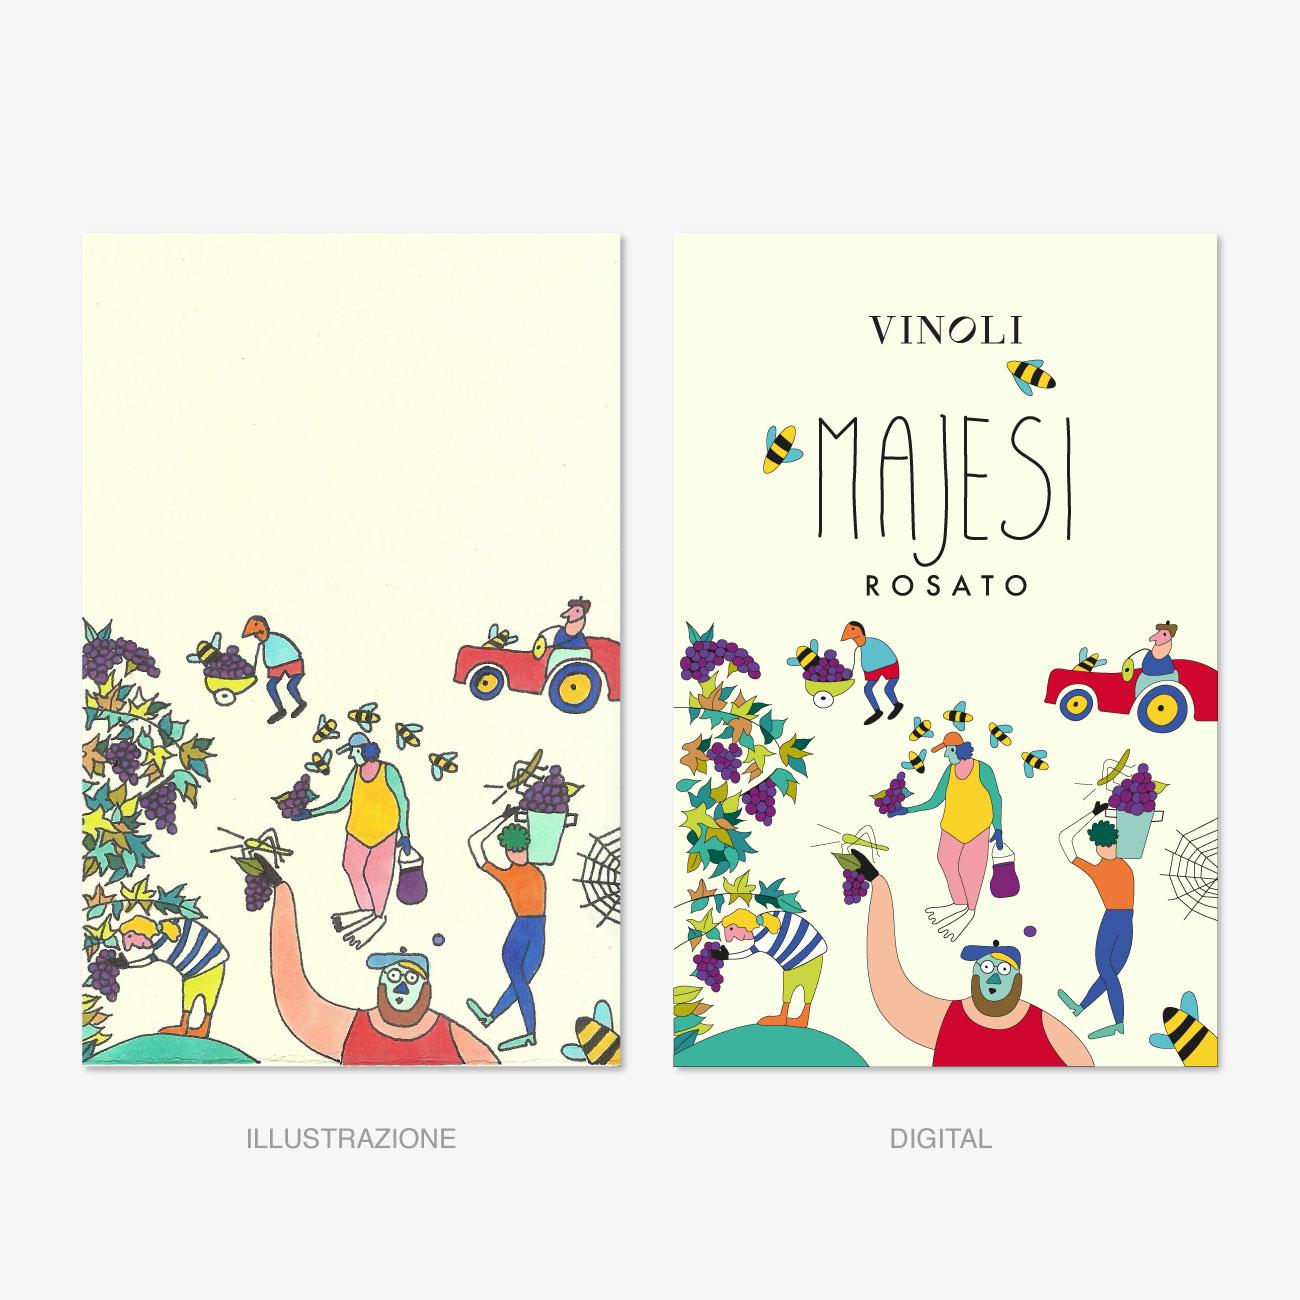 https://www.orlandinifrancesco.com/wp/wp-content/uploads/2019/07/Digital-Label-Majesi-Cantina-Vinoli.jpg